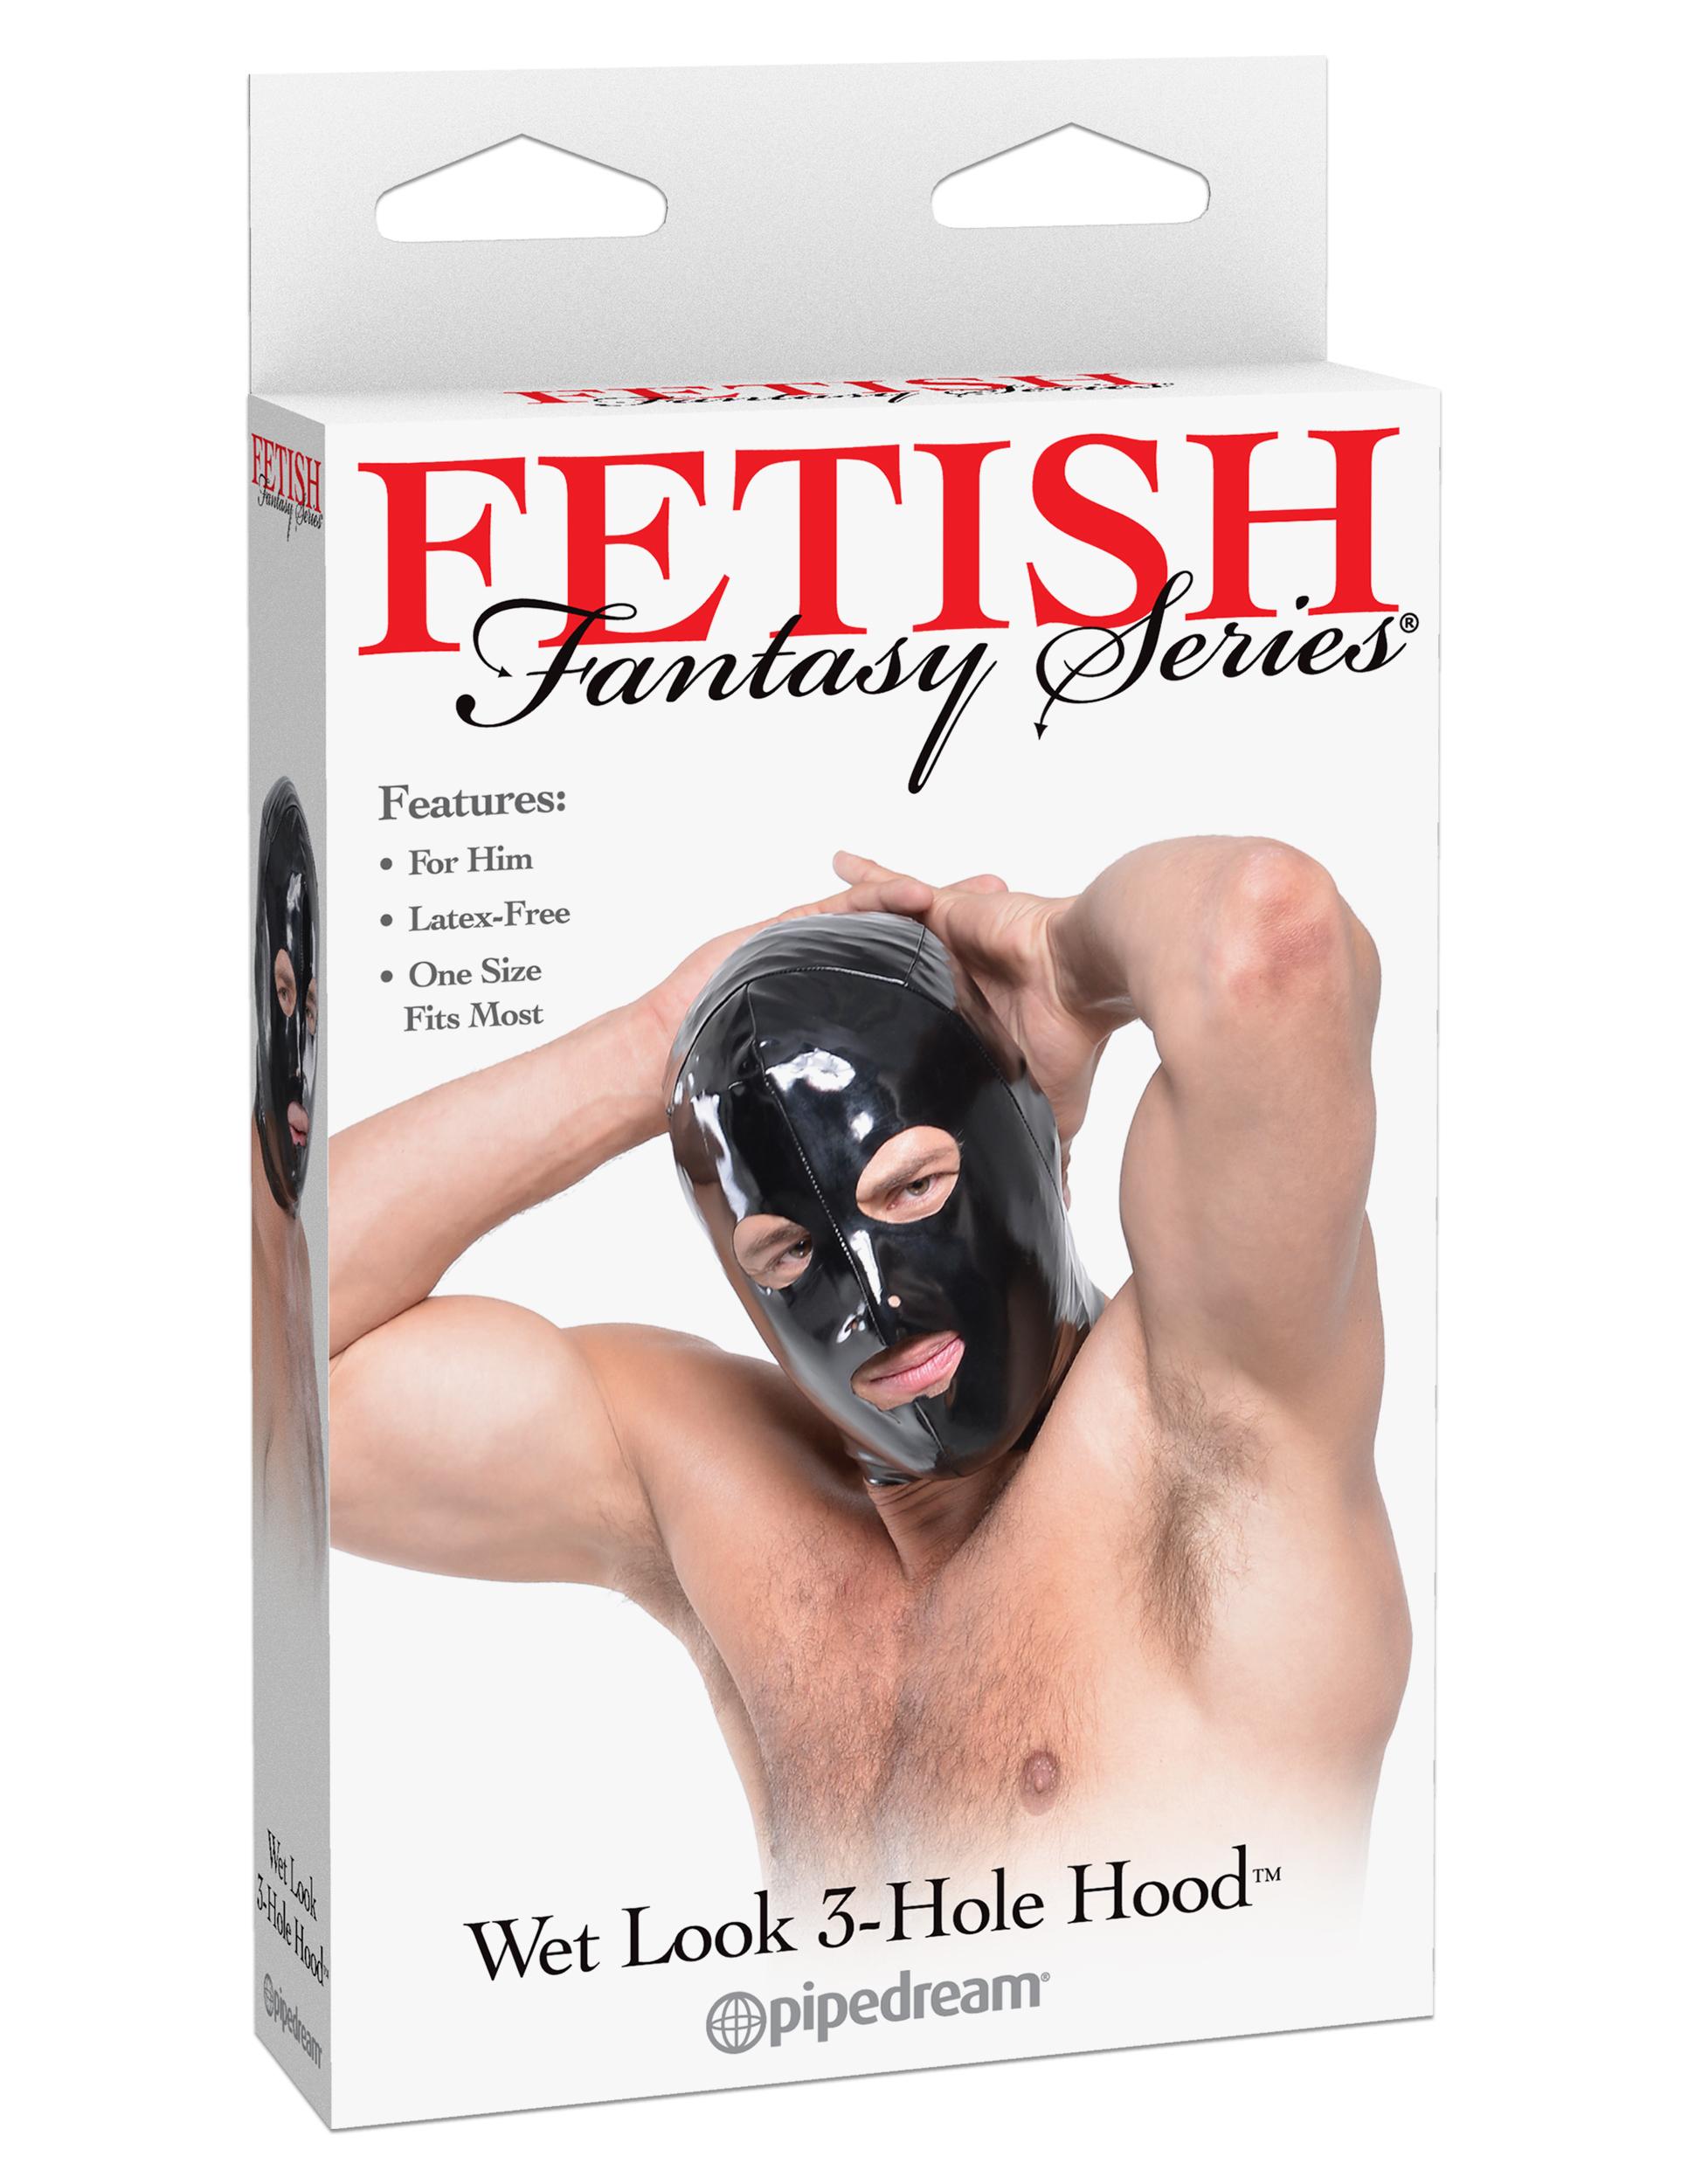 FETISH FANTASY WET LOOK 3 HOLE HOOD FOR HIM